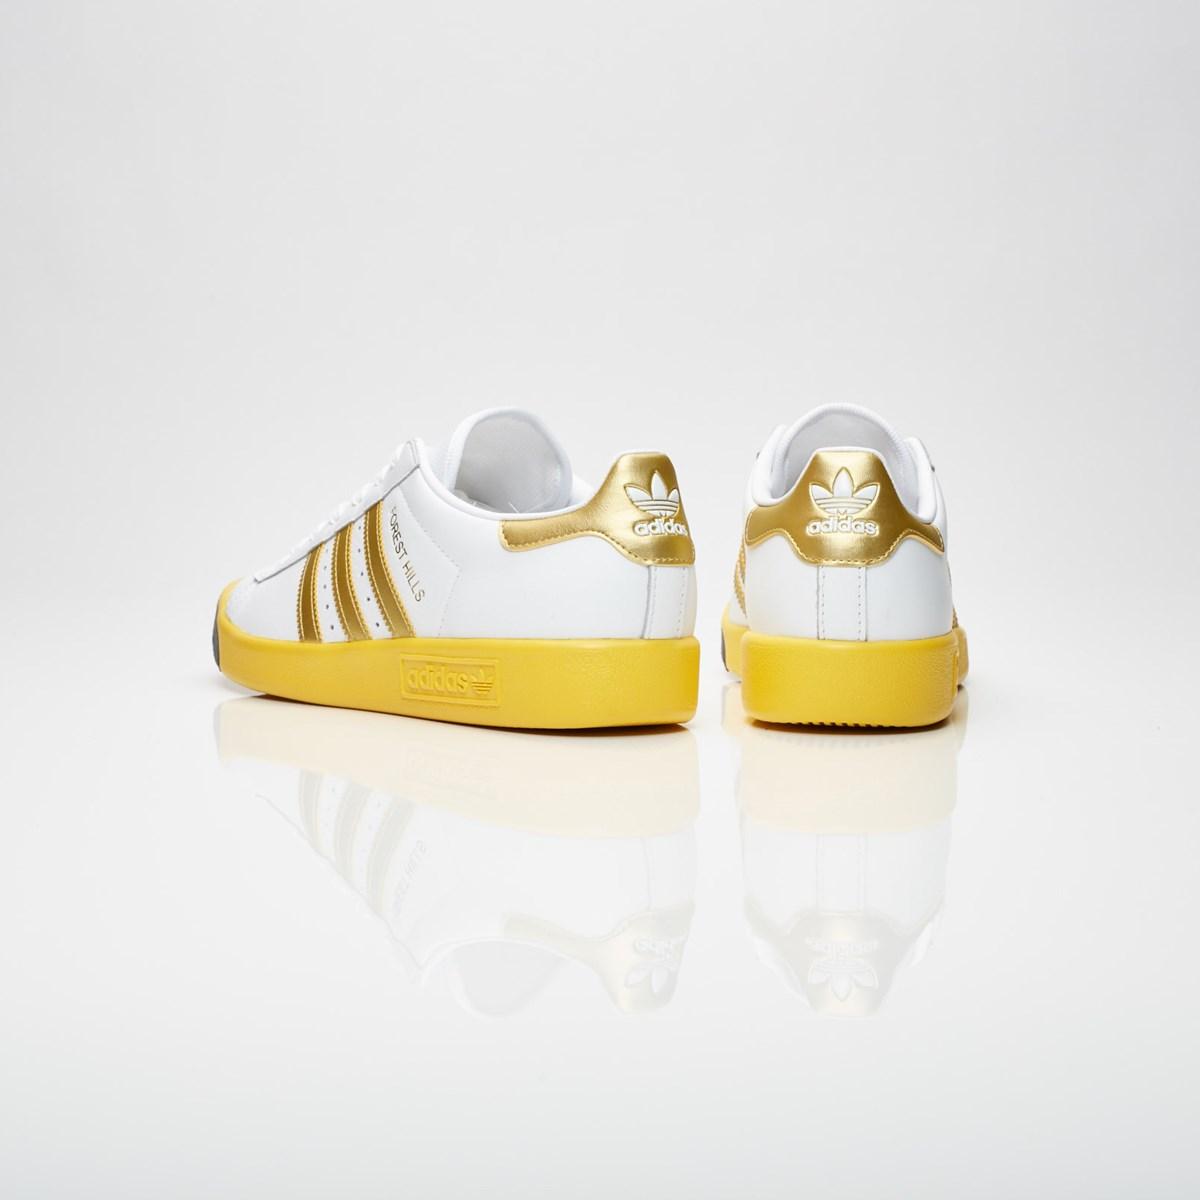 buy popular c1780 b2615 adidas Forest Hills - Cq2083 - Sneakersnstuff   sneakers   streetwear  online since 1999